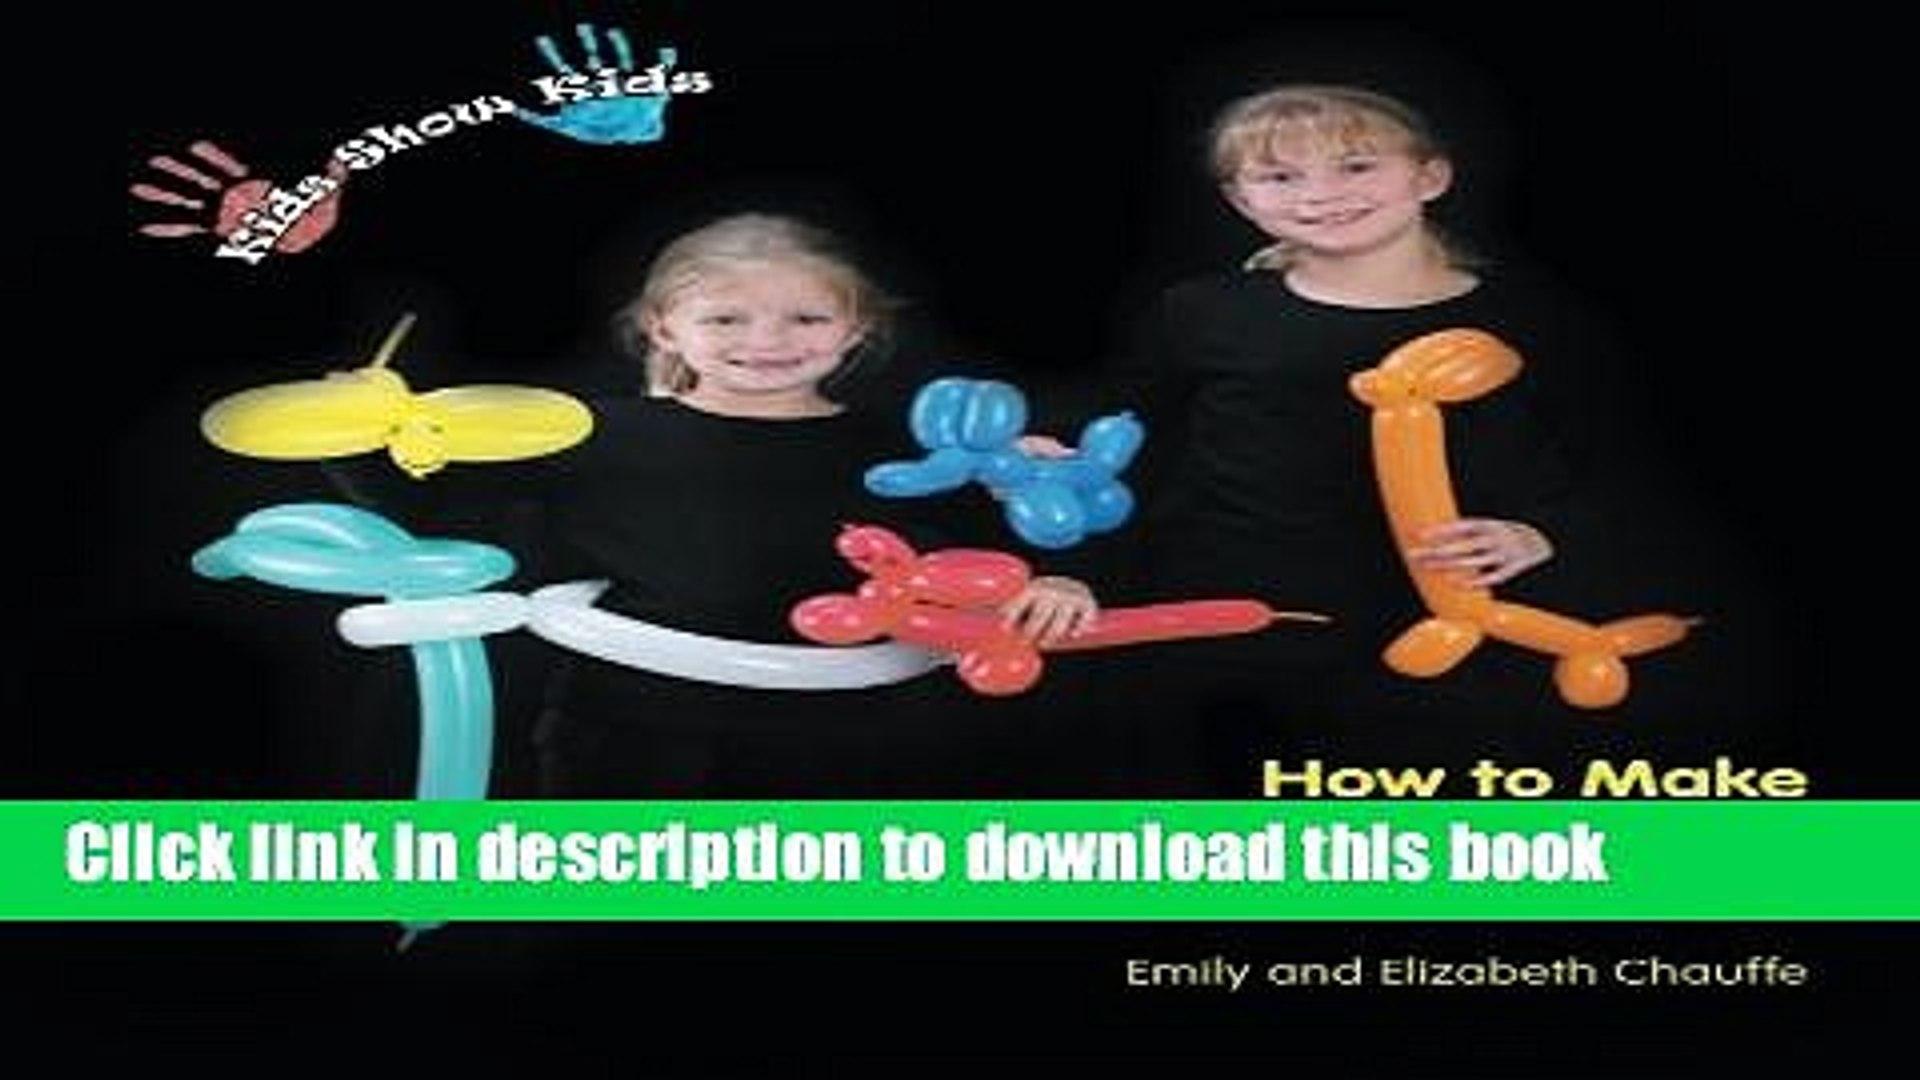 [Popular Books] Kids Show Kids How to Make Balloon Animals Free Online